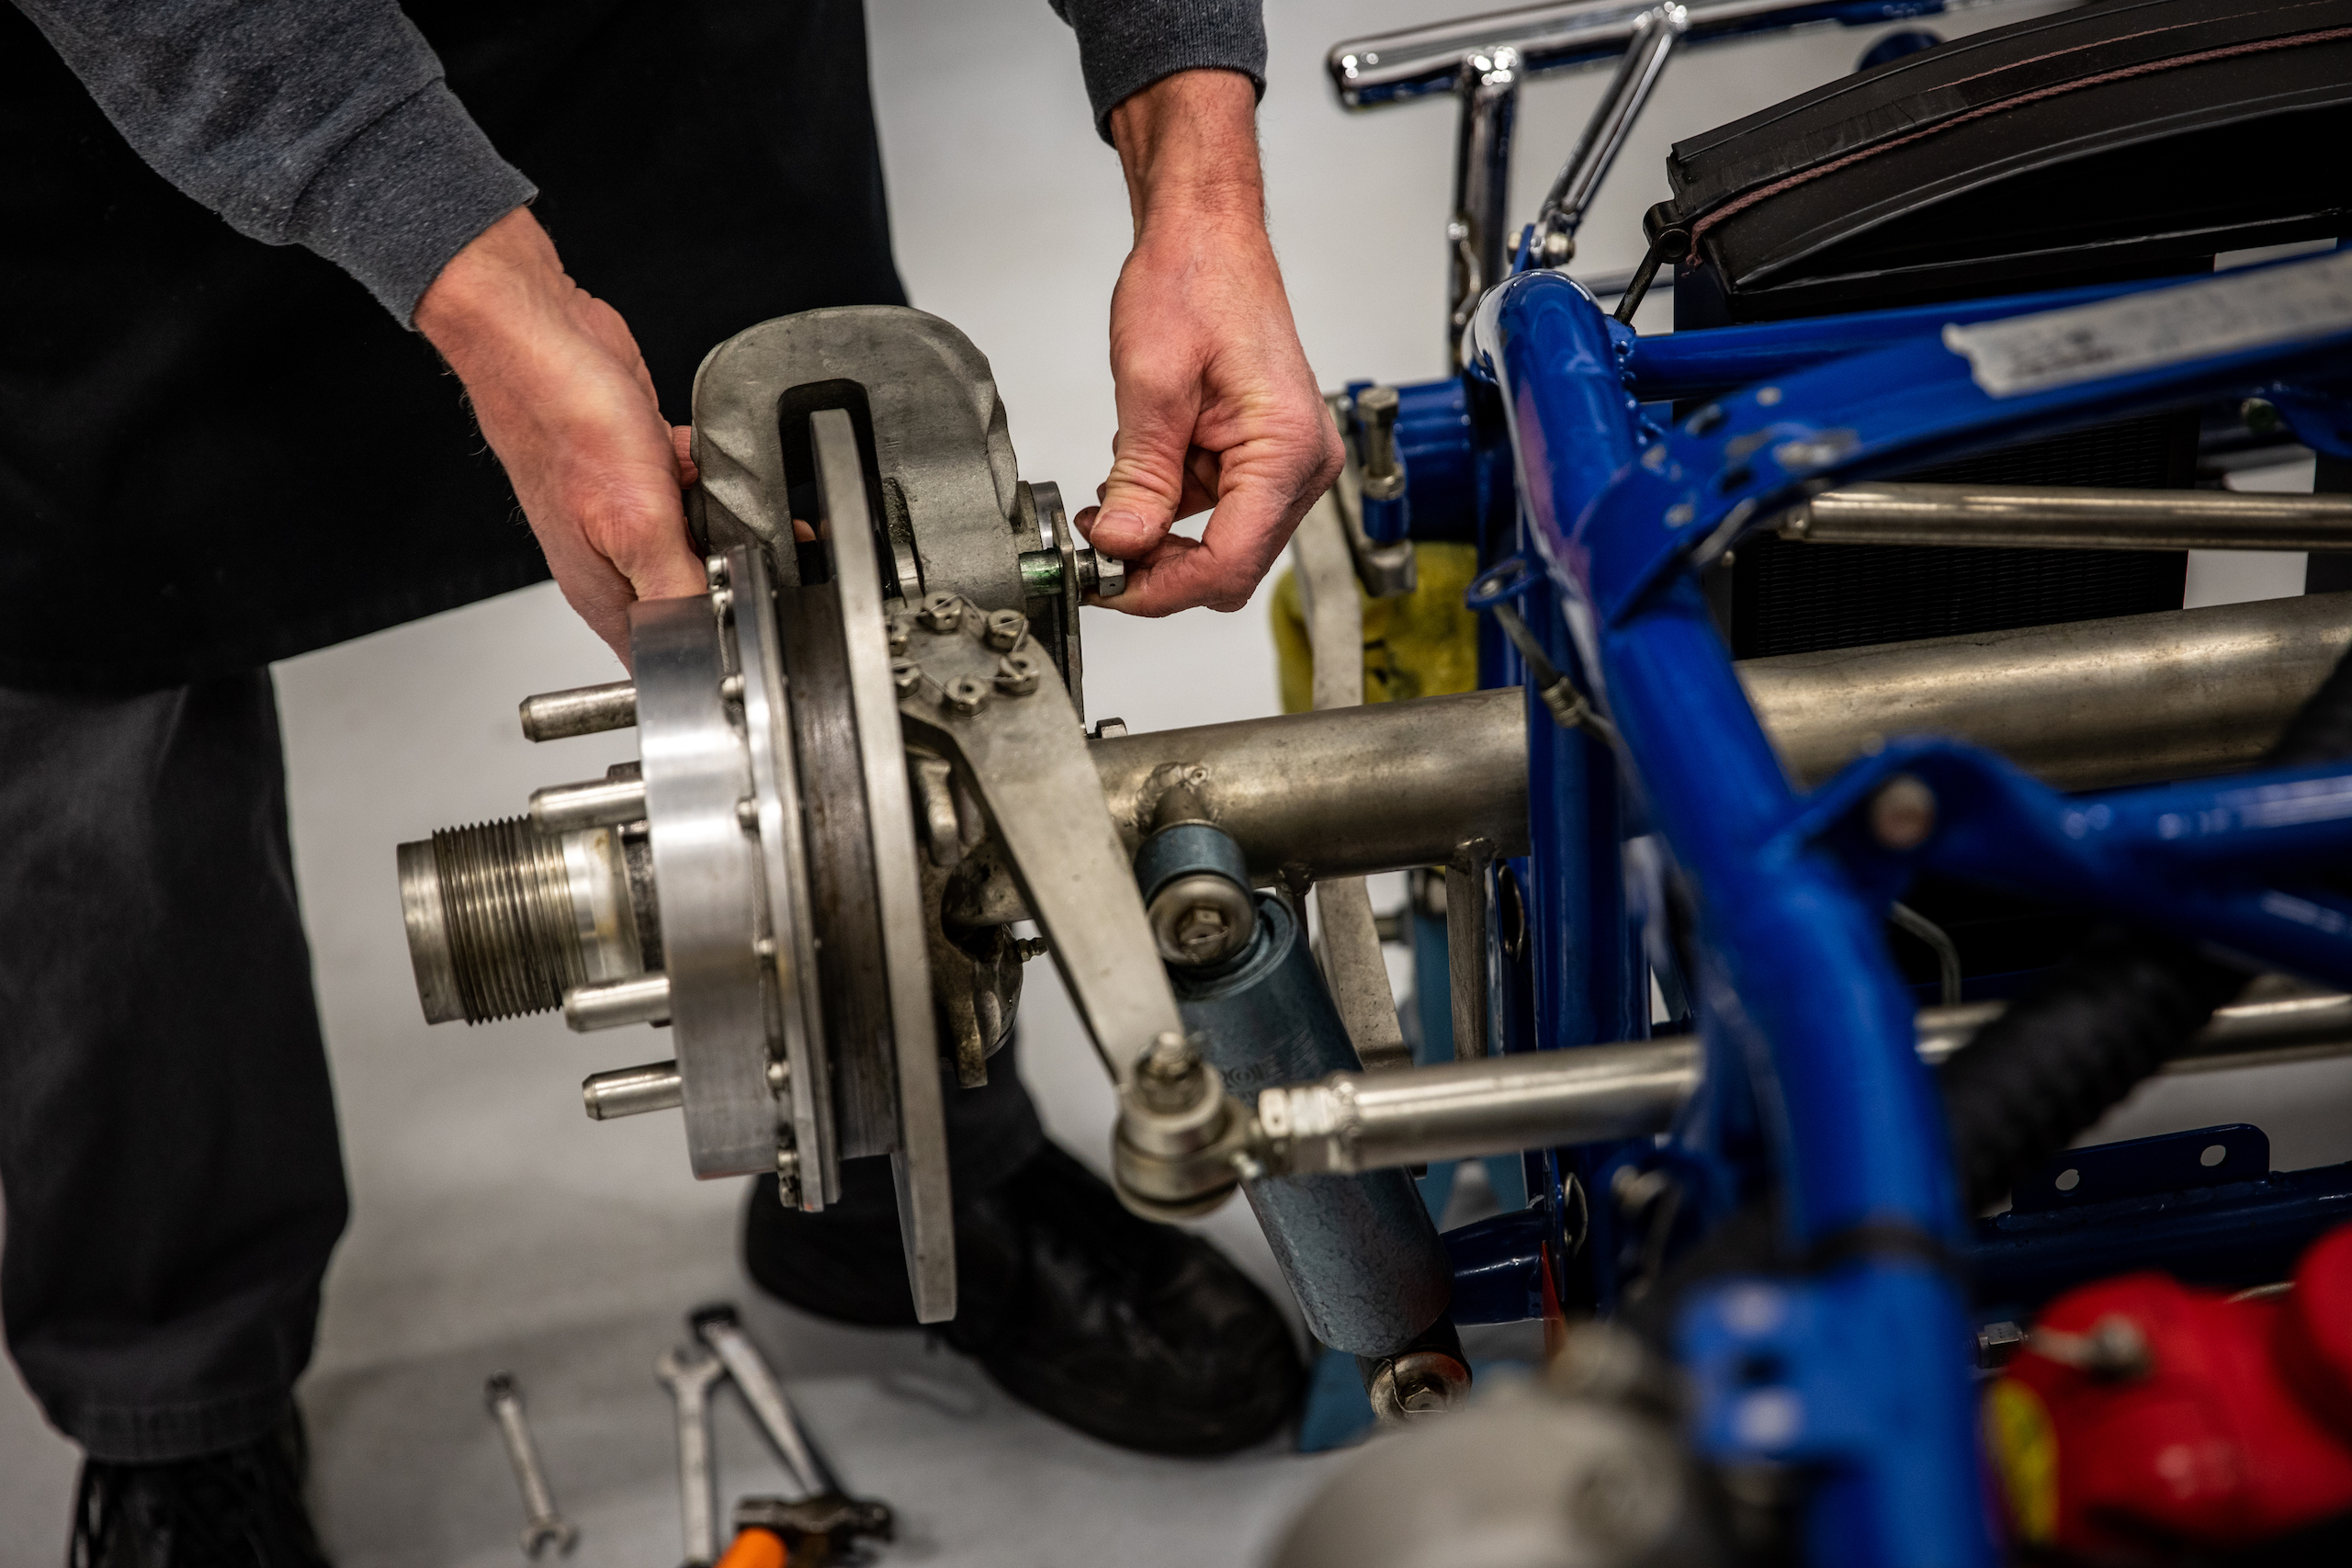 Turn 4 Restorations brakes